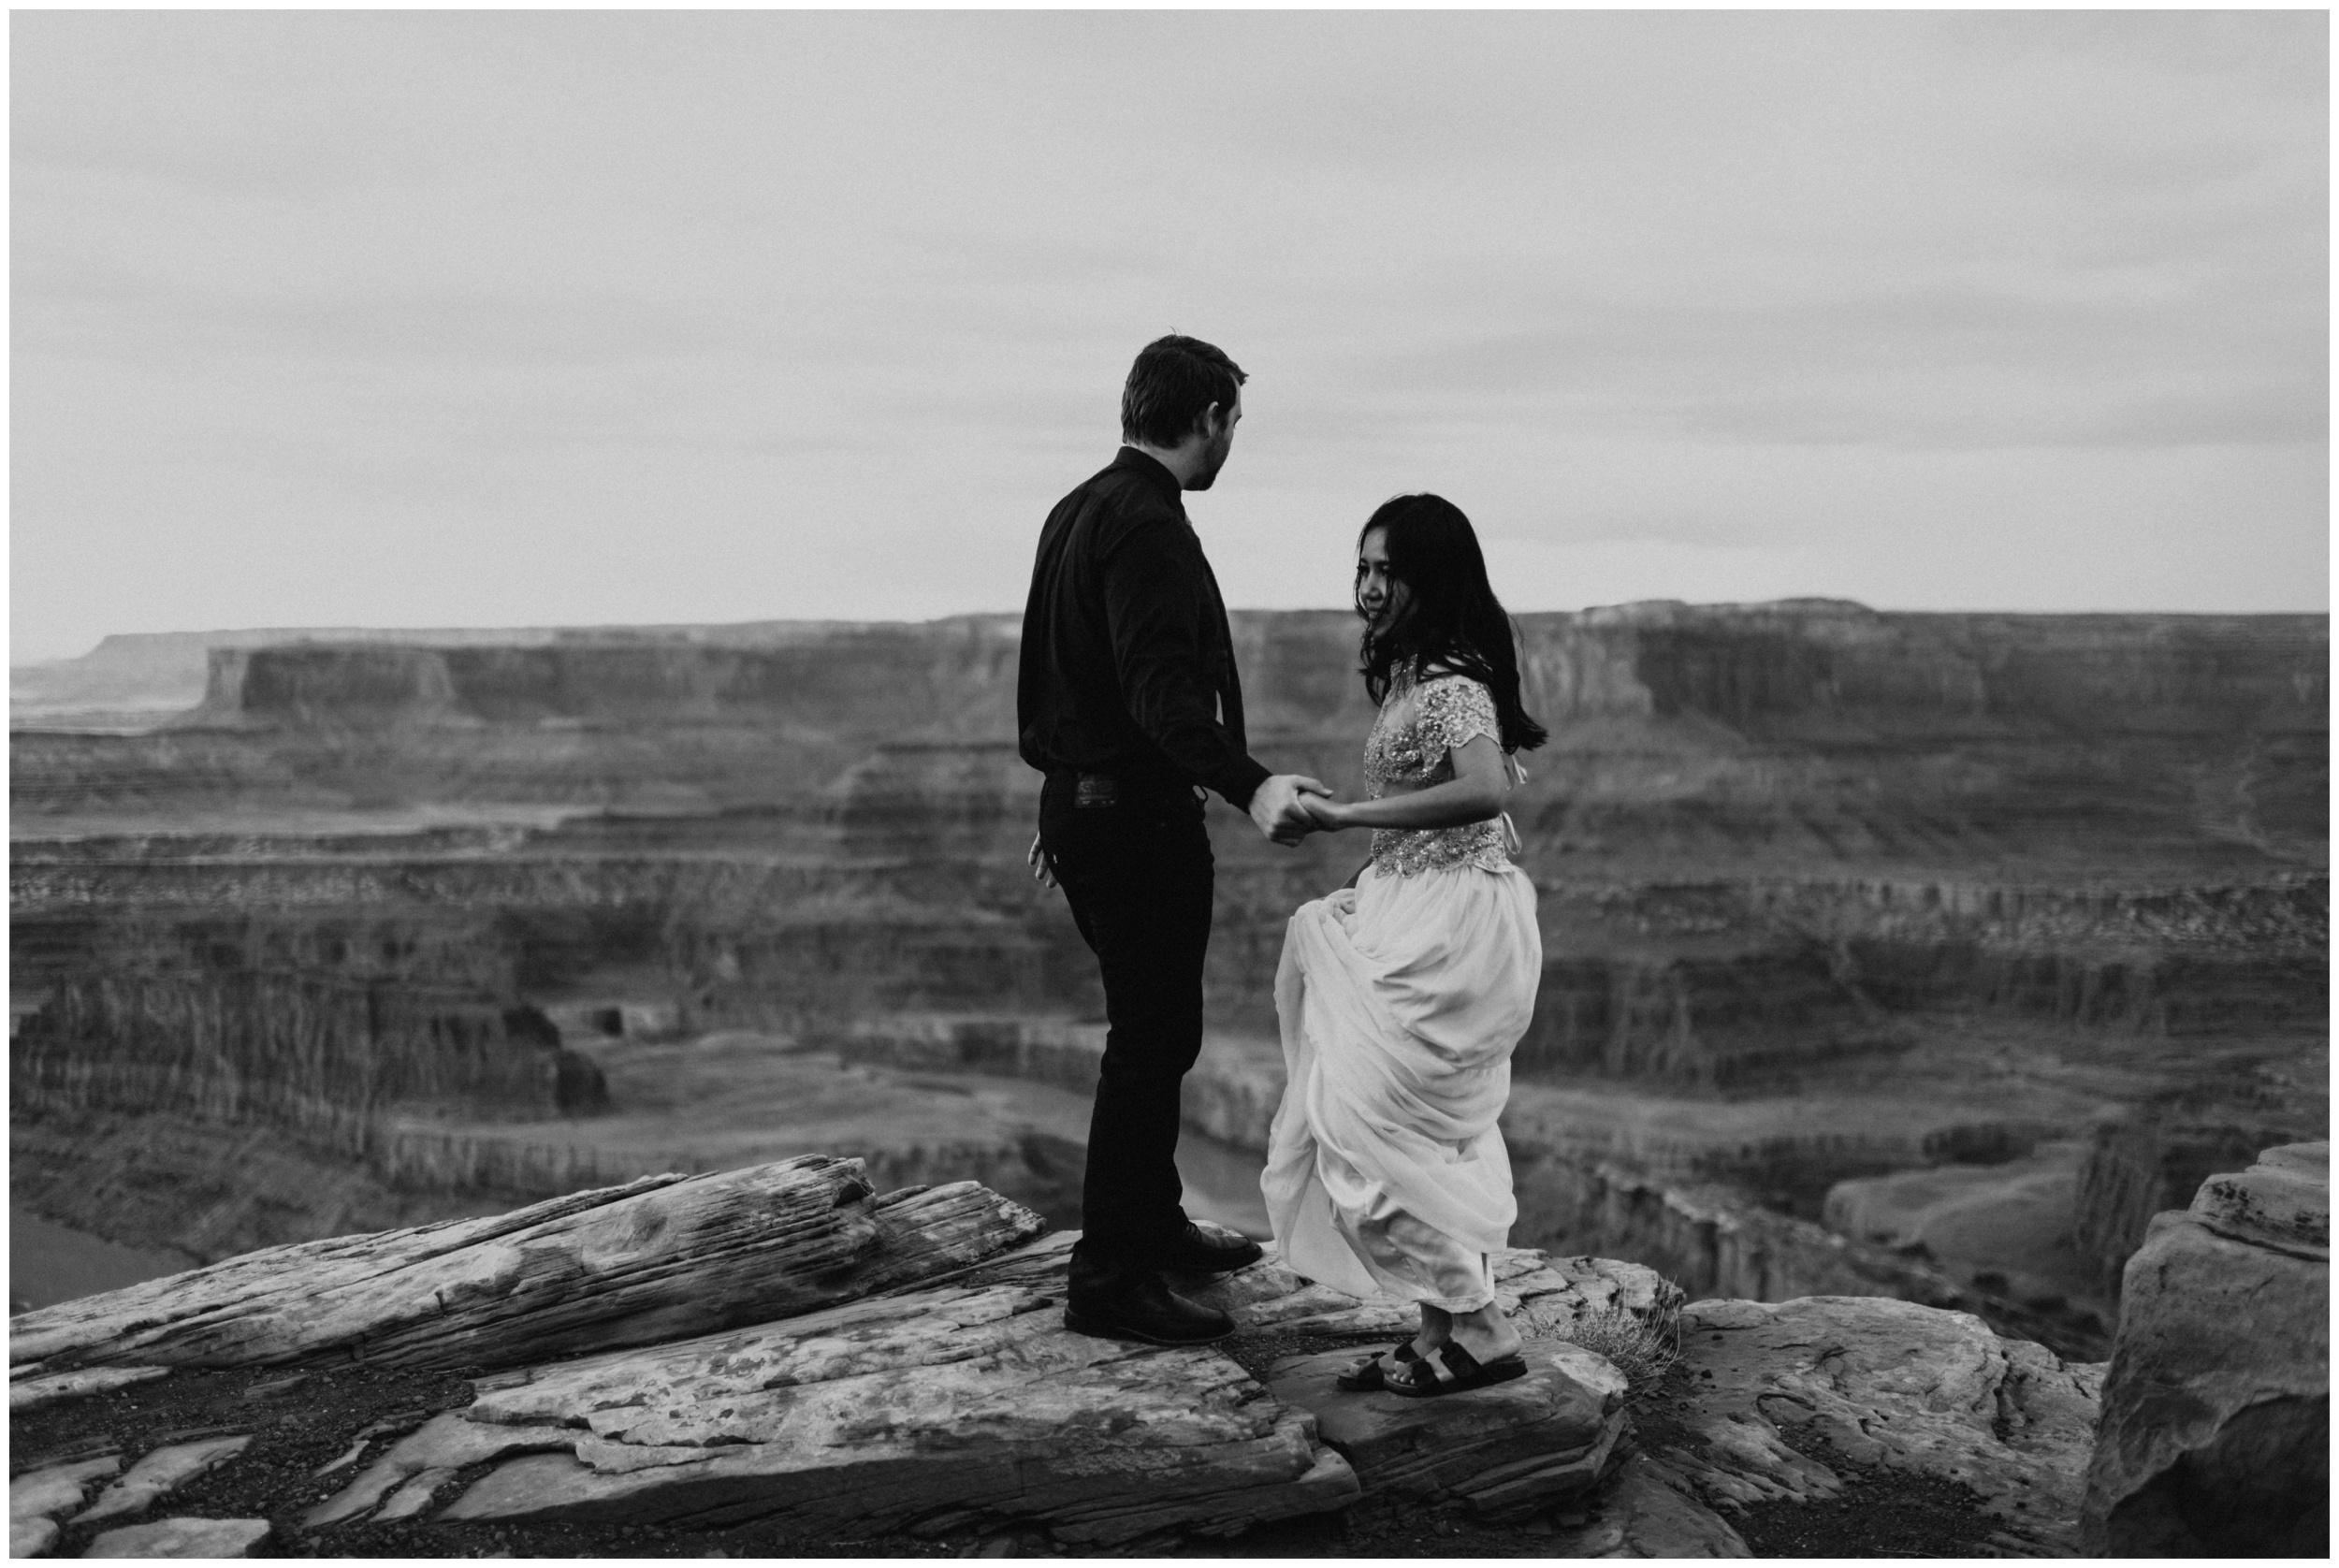 emotional portrait of couple at Dead Horse Point State Park | Elopement Photographer www.riversandroadsphotography.com